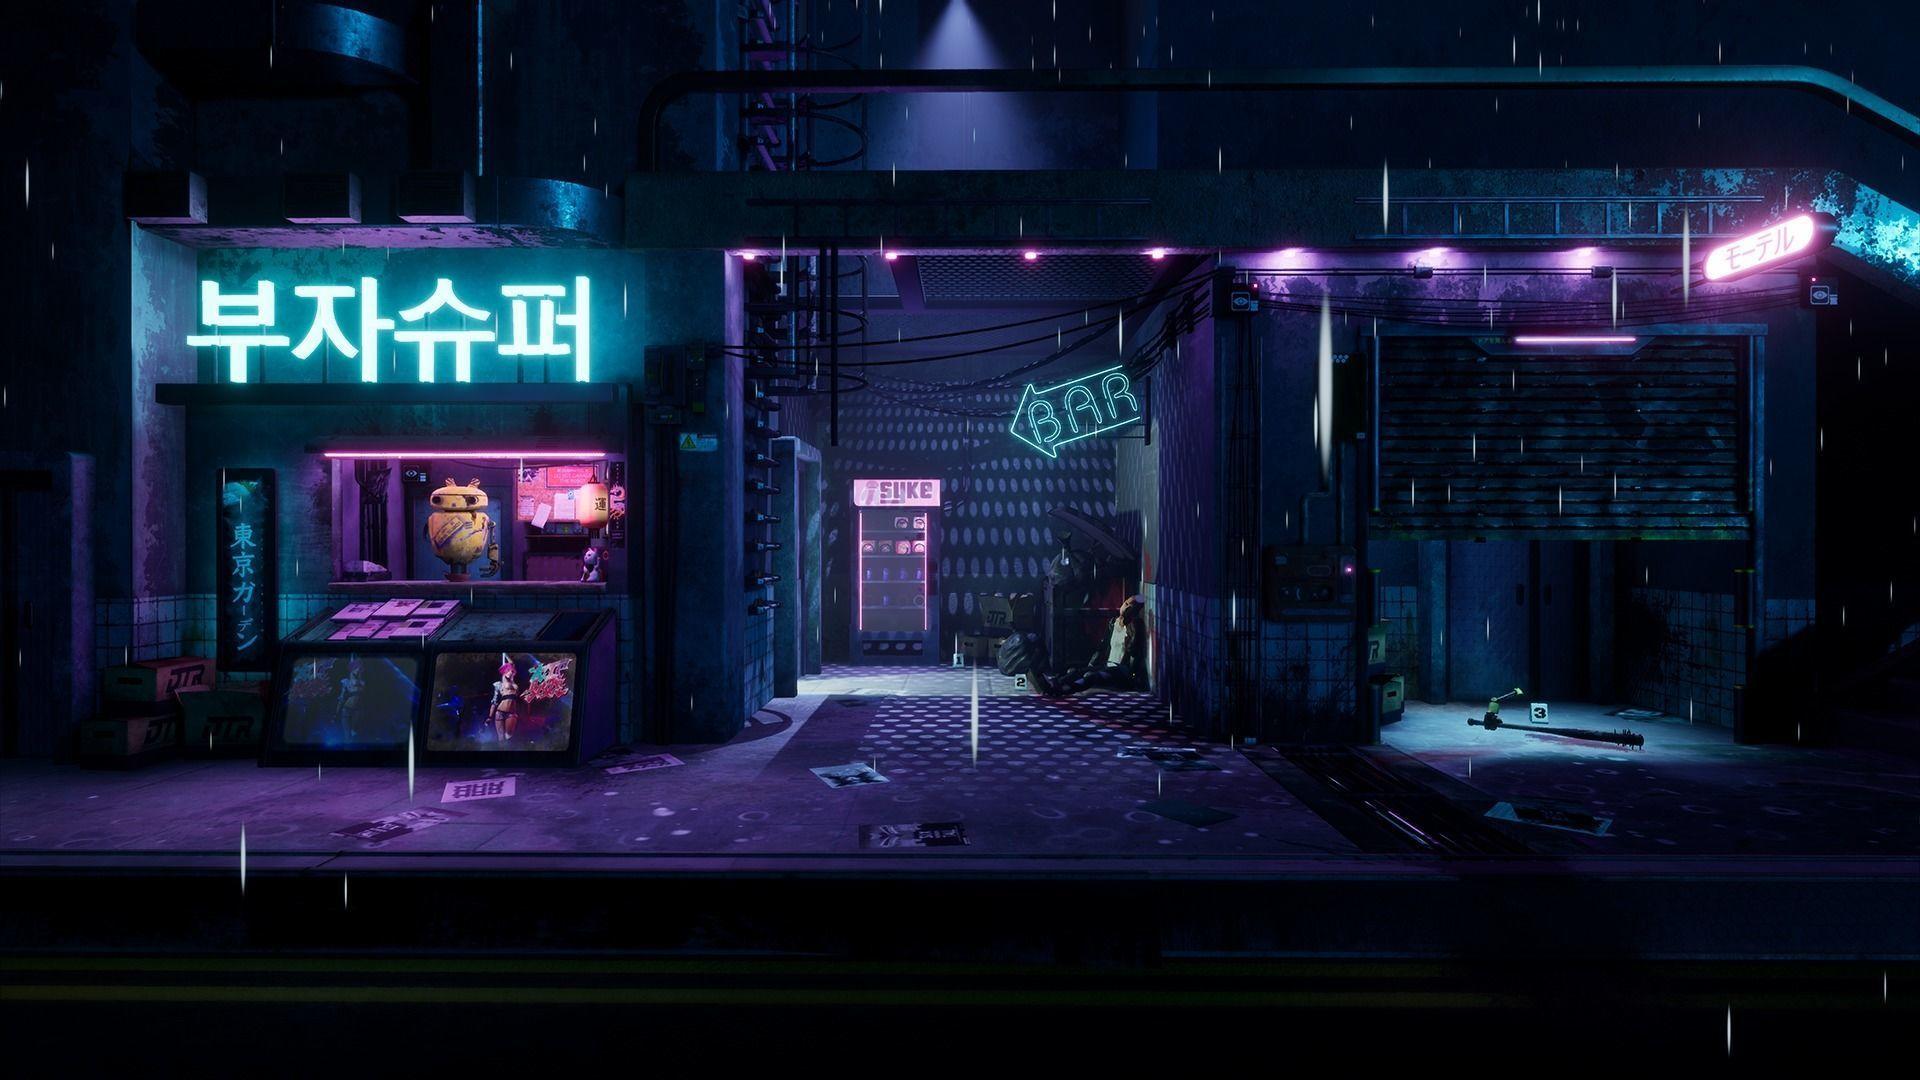 Cyberpunk Grunge Sci-Fi Asset Pack | 3D model